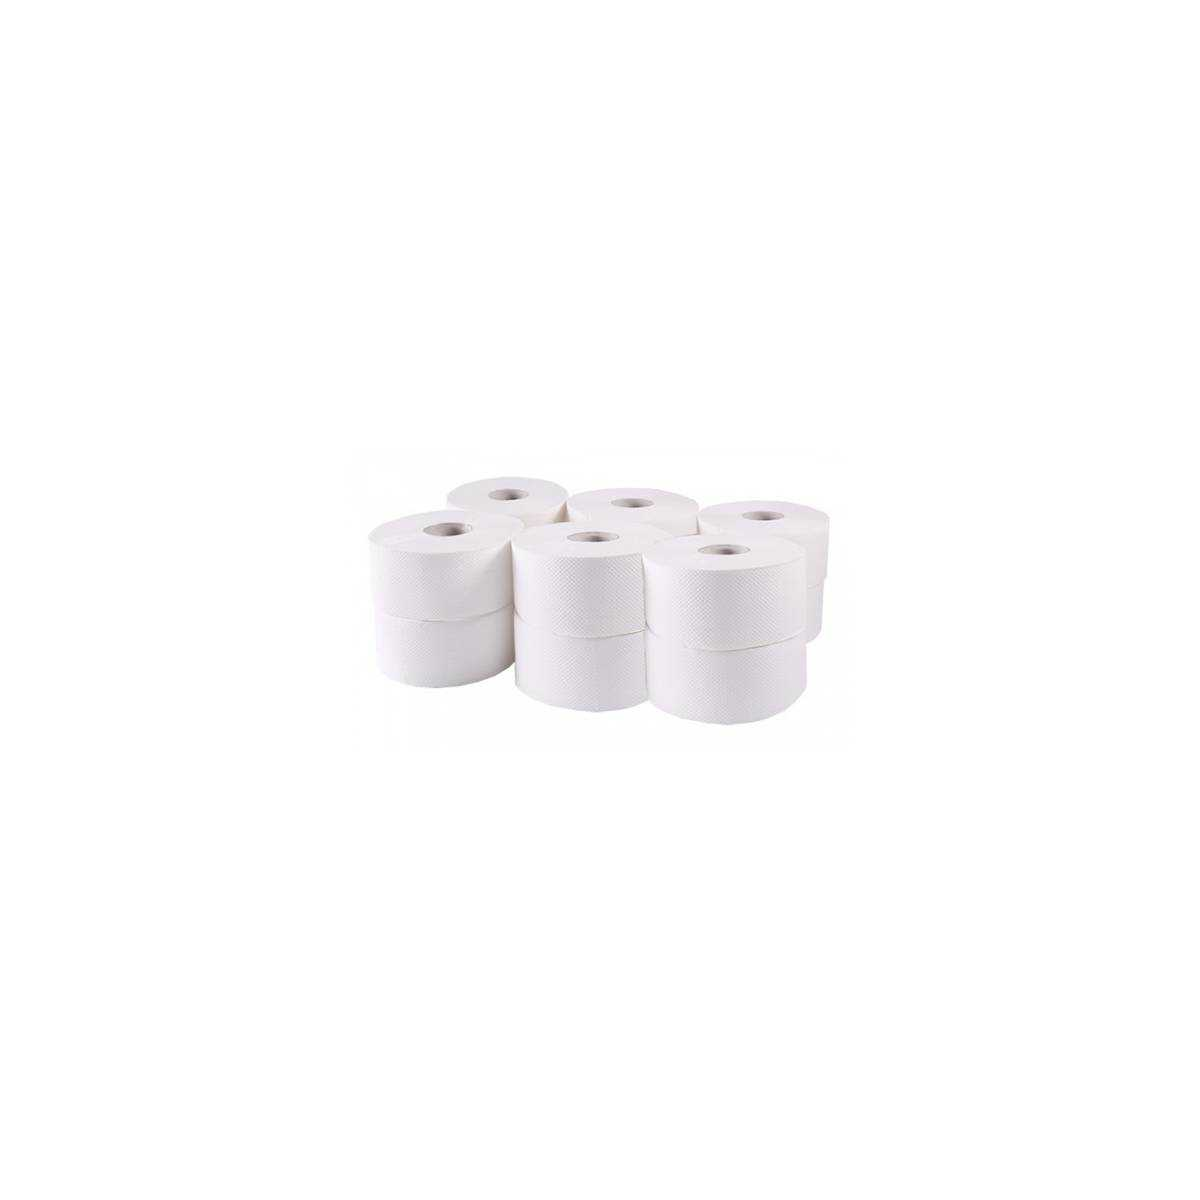 Туалетная бумага в рулоне JUMBO (B202) B202 Tischa Papier